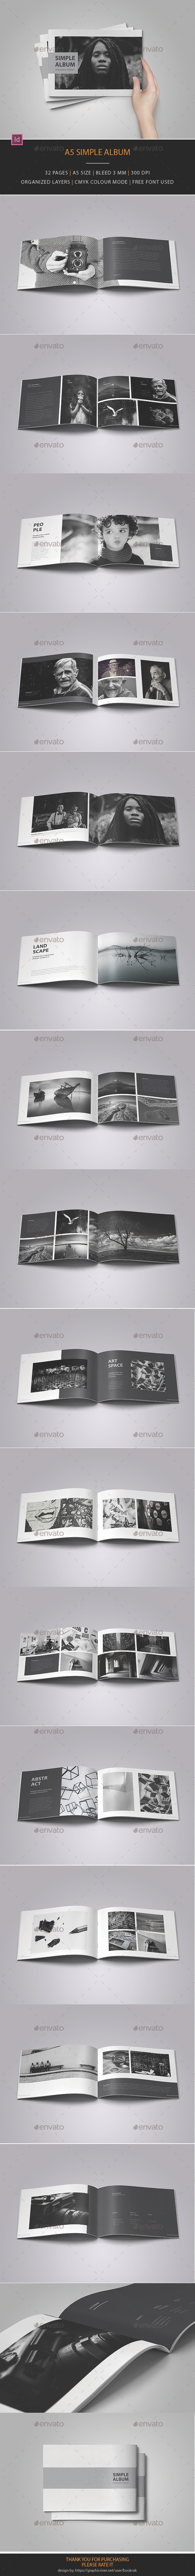 A5 Simple Album - Photo Albums Print Templates